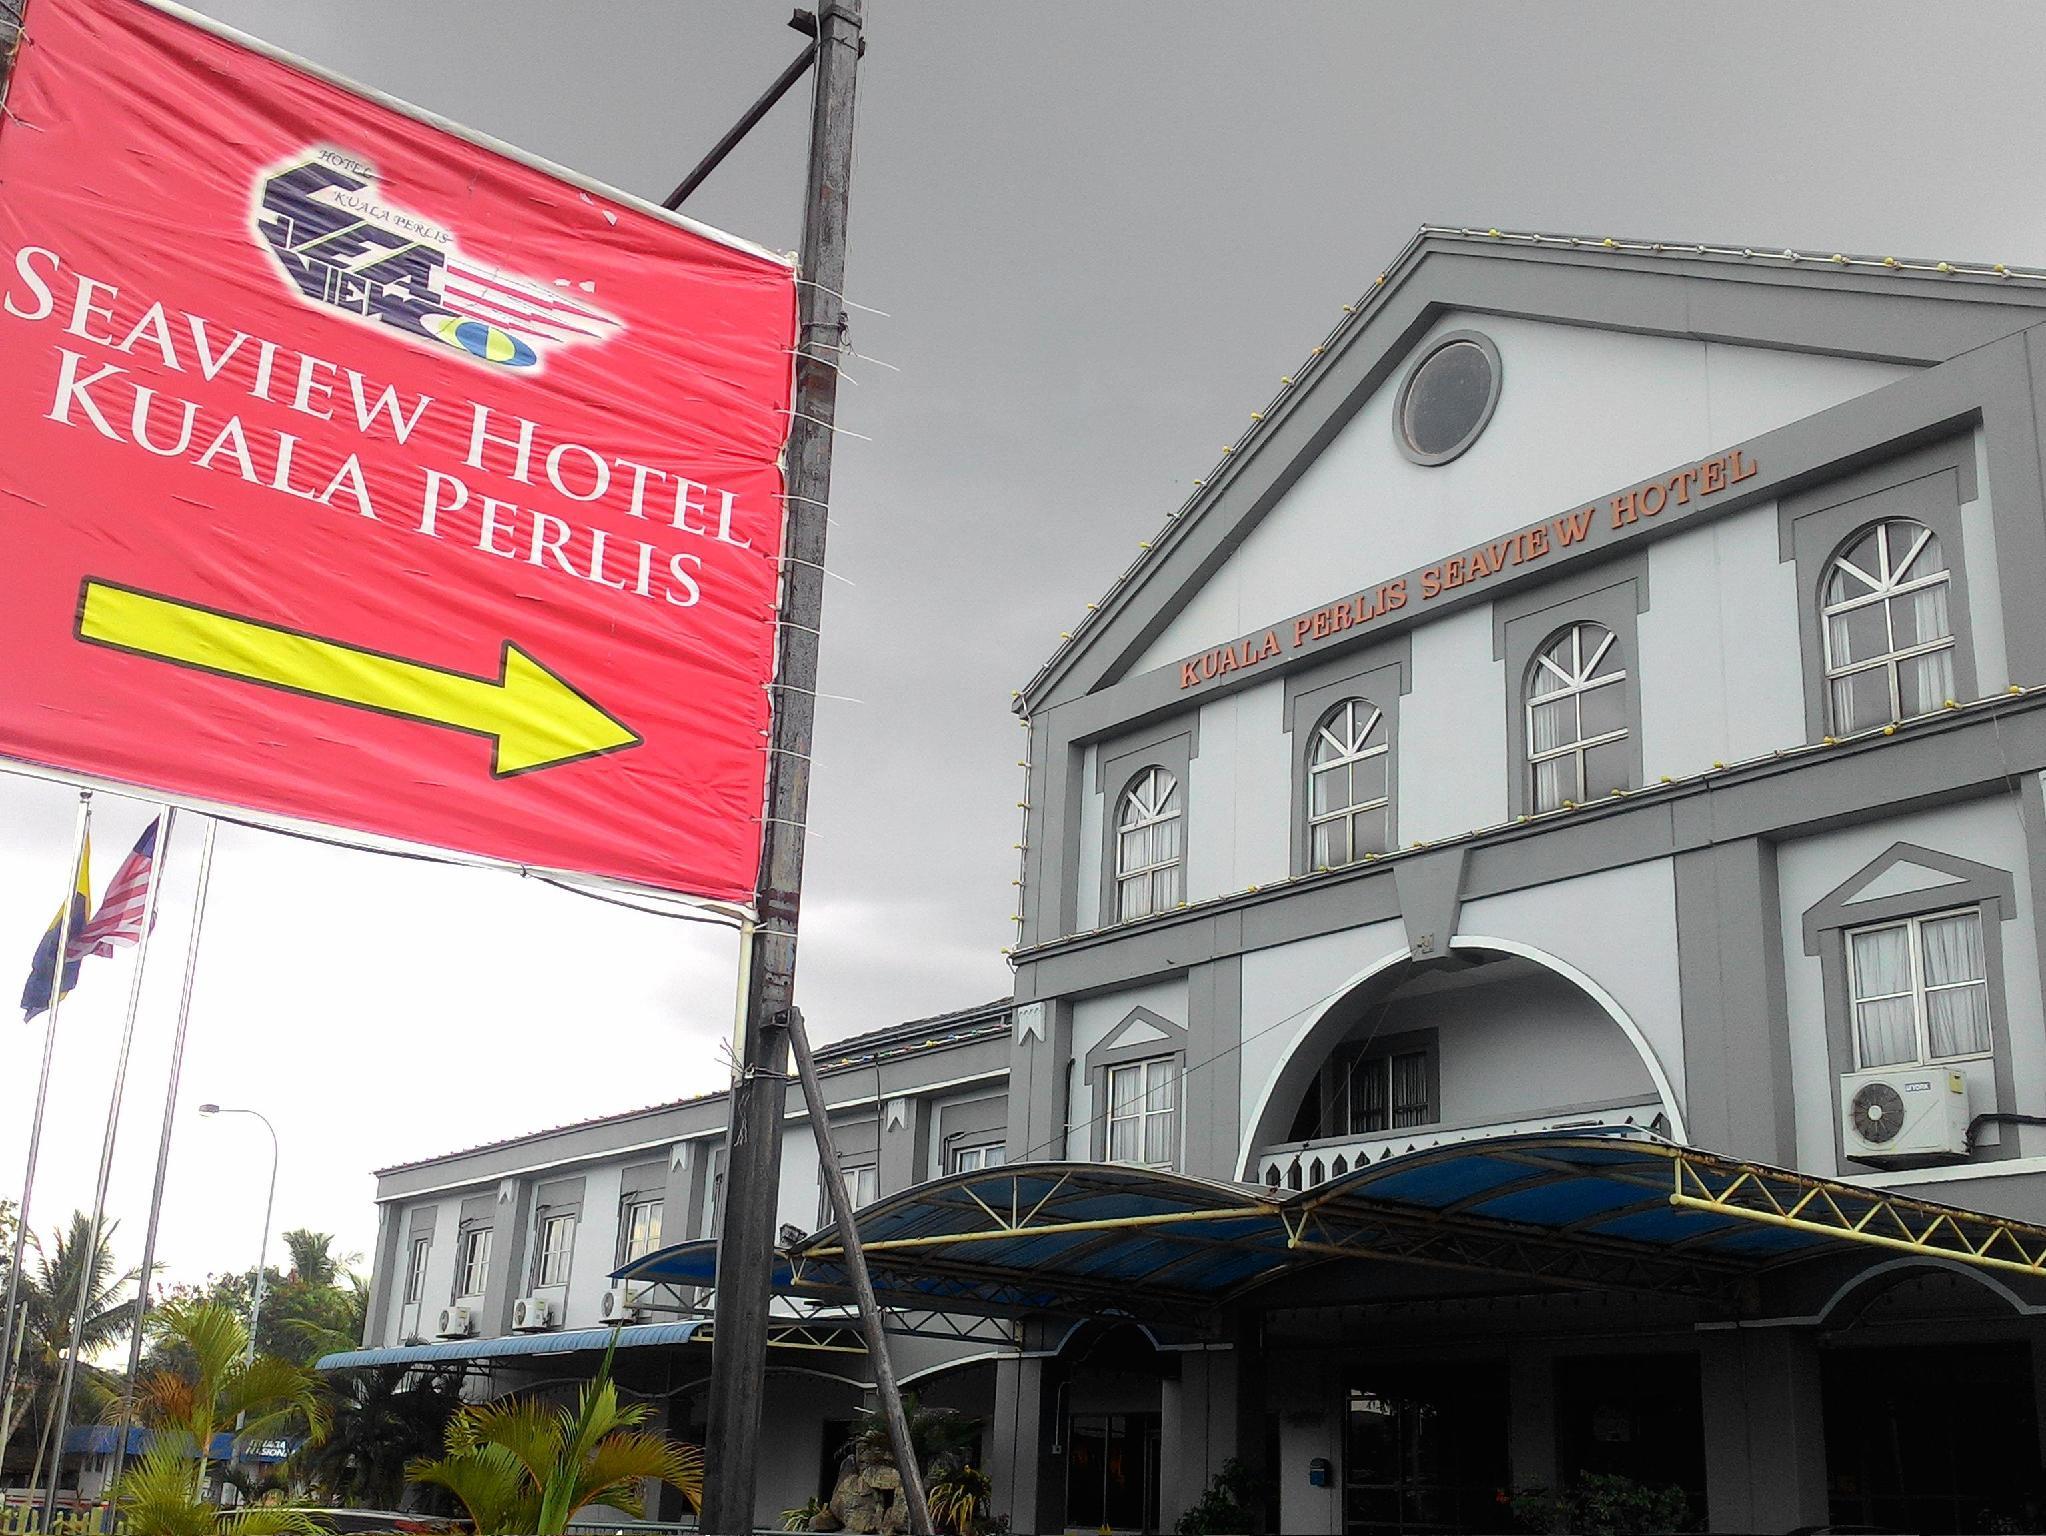 Seaview Hotel Kuala Perlis, Perlis